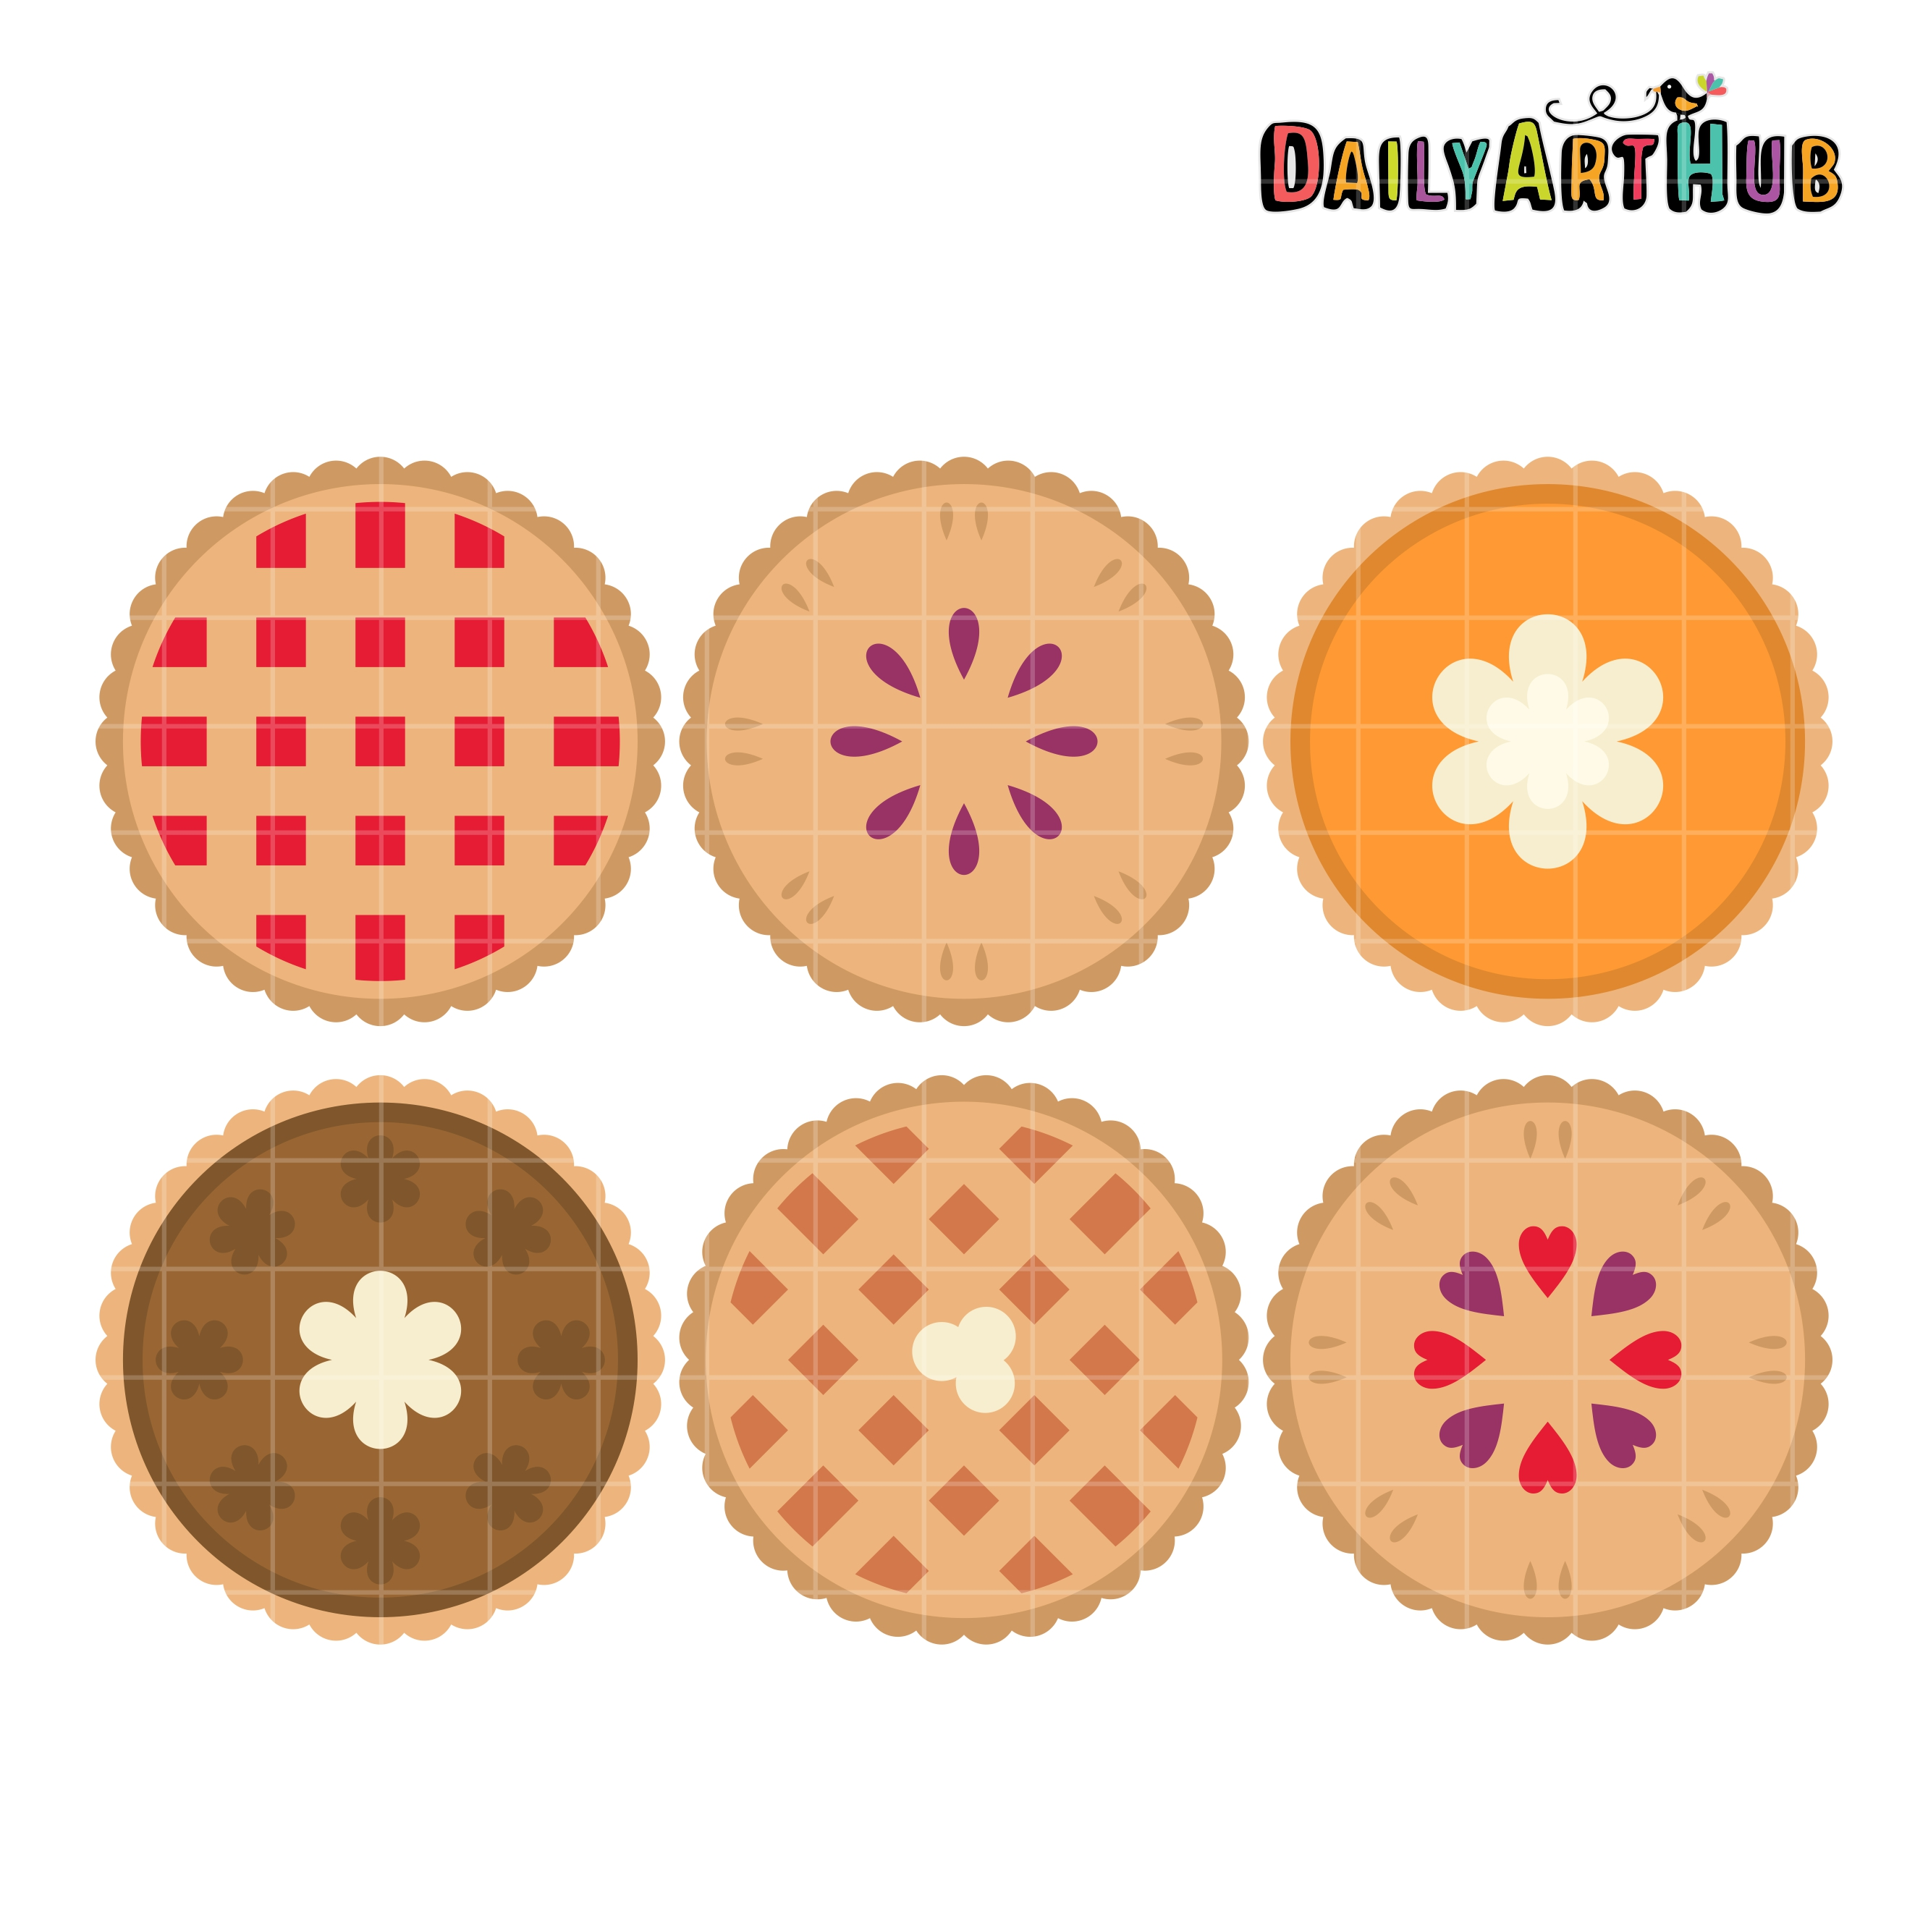 Thanksgiving Pies Clip Art Set - Daily Art Hub - Free Clip ... (2664 x 2670 Pixel)